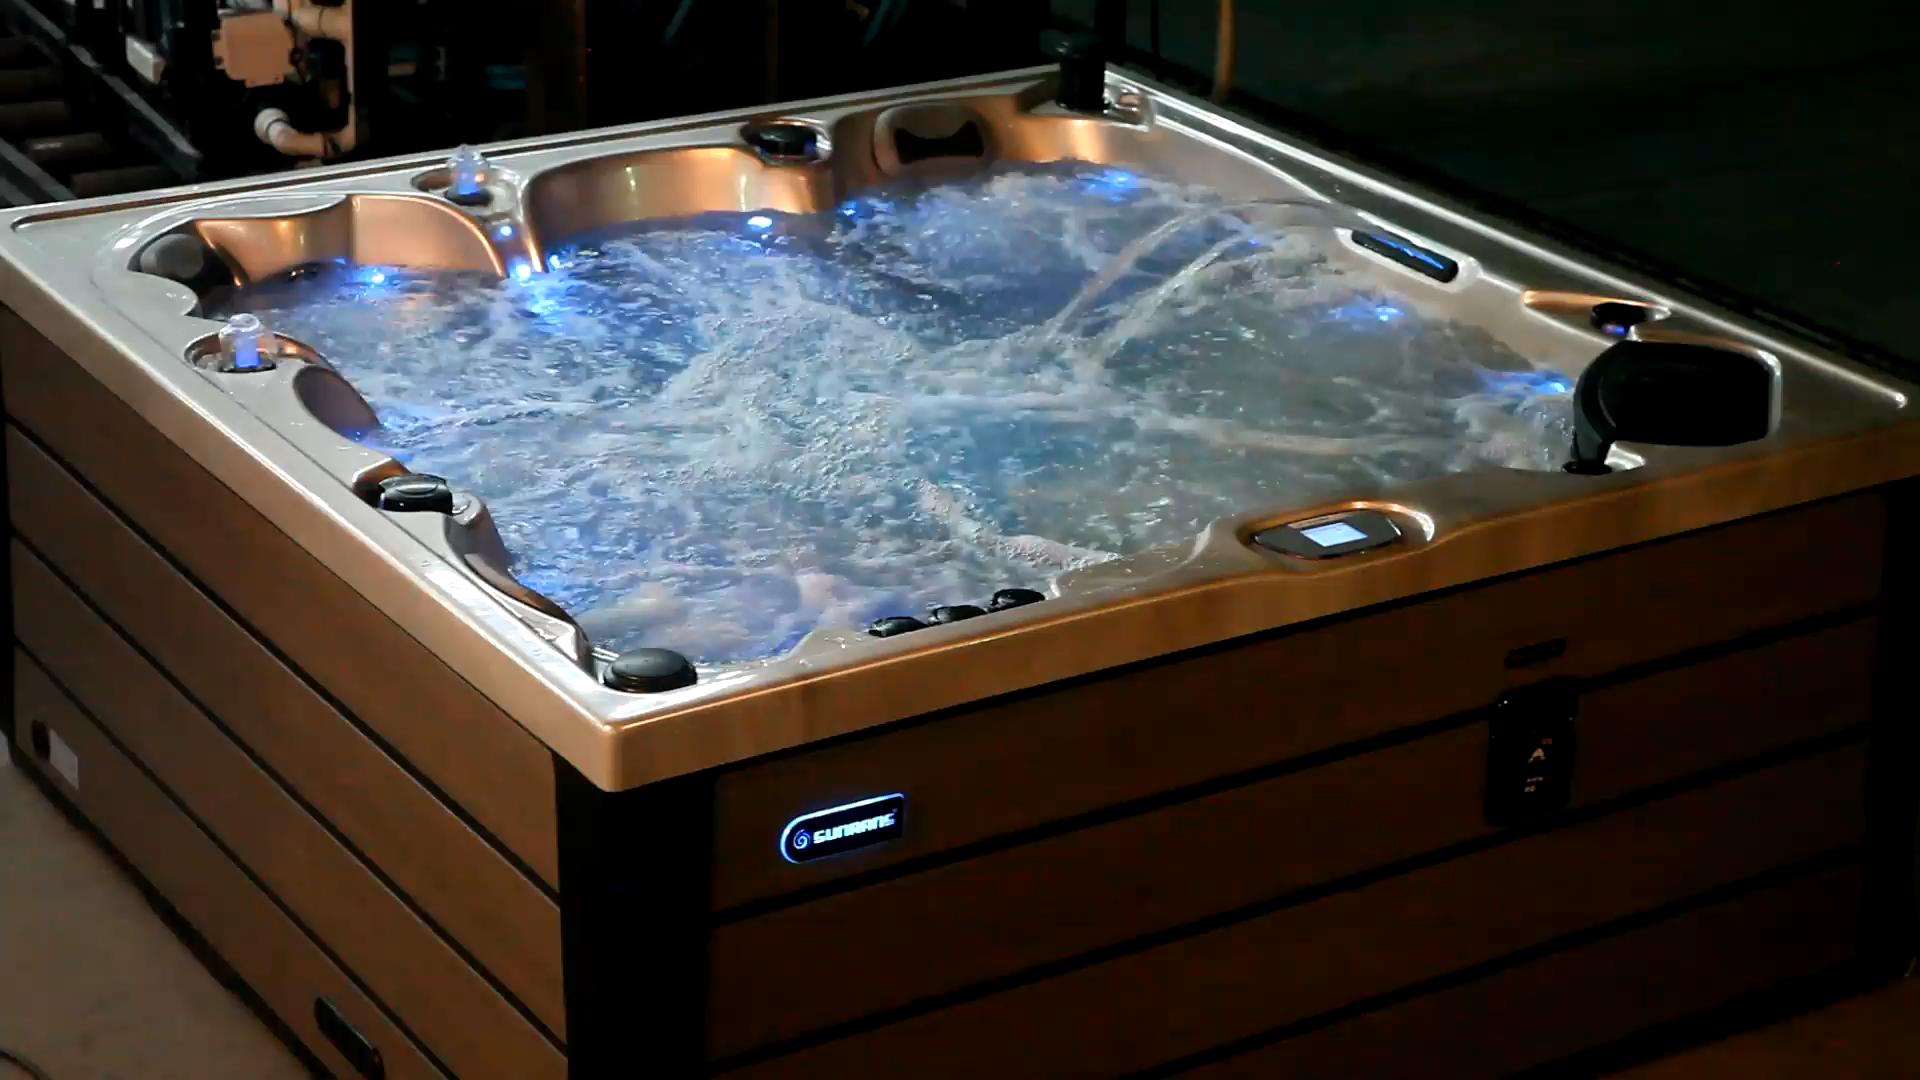 Sunrans Spa For 5 People Use Video Jacuzzi Outdoor Bathroom Design Luxury Hot Tub Swim Spa